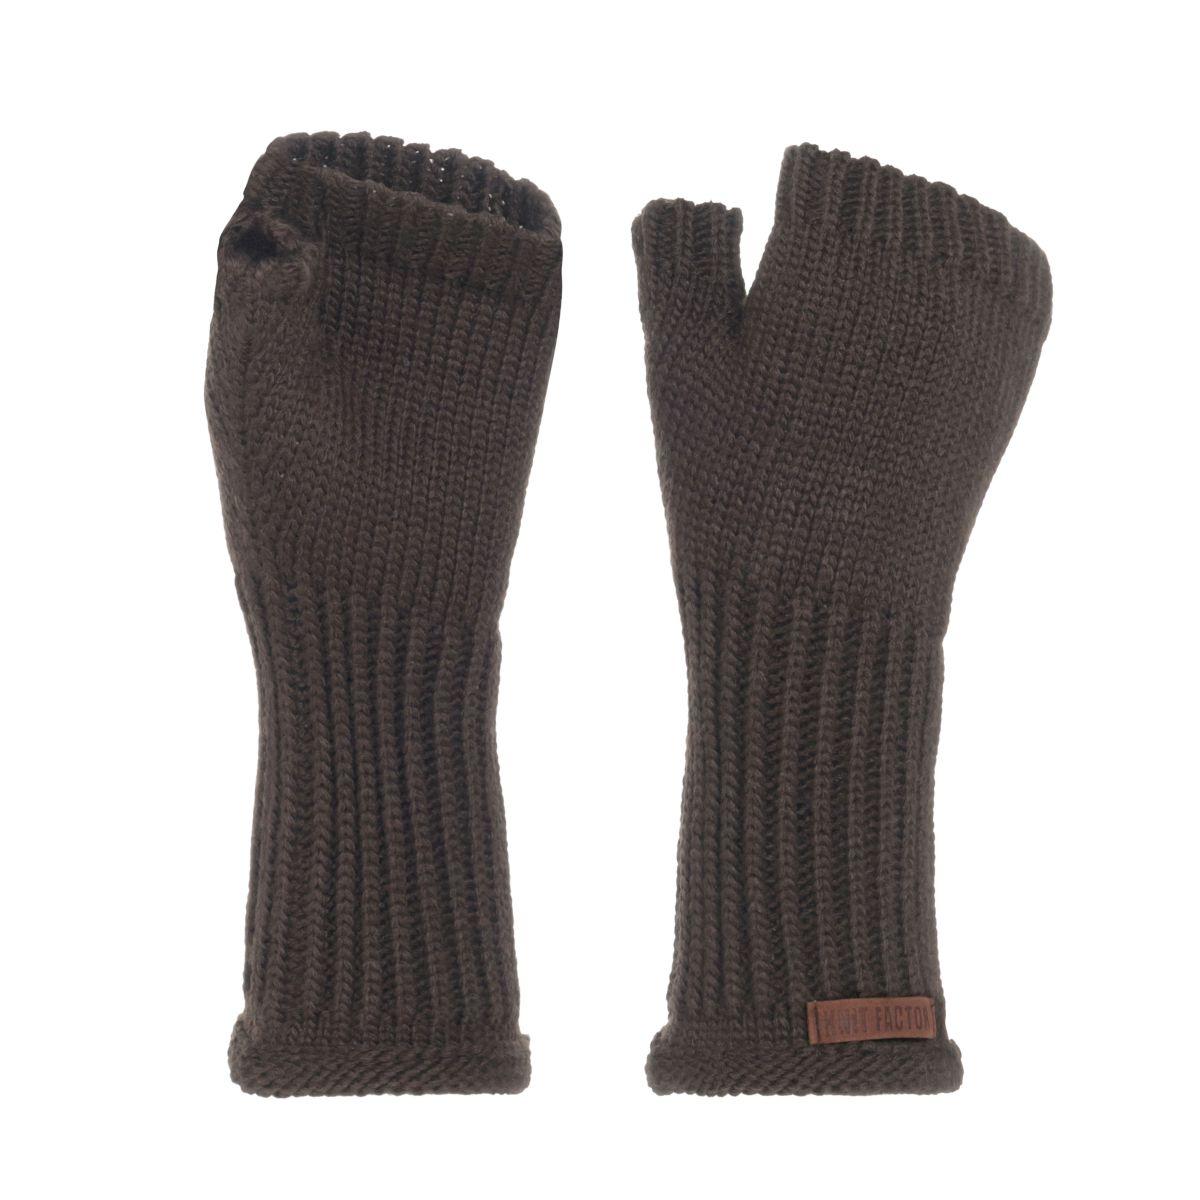 knit factory kf14607502950 cleo handschoenen taupe 1